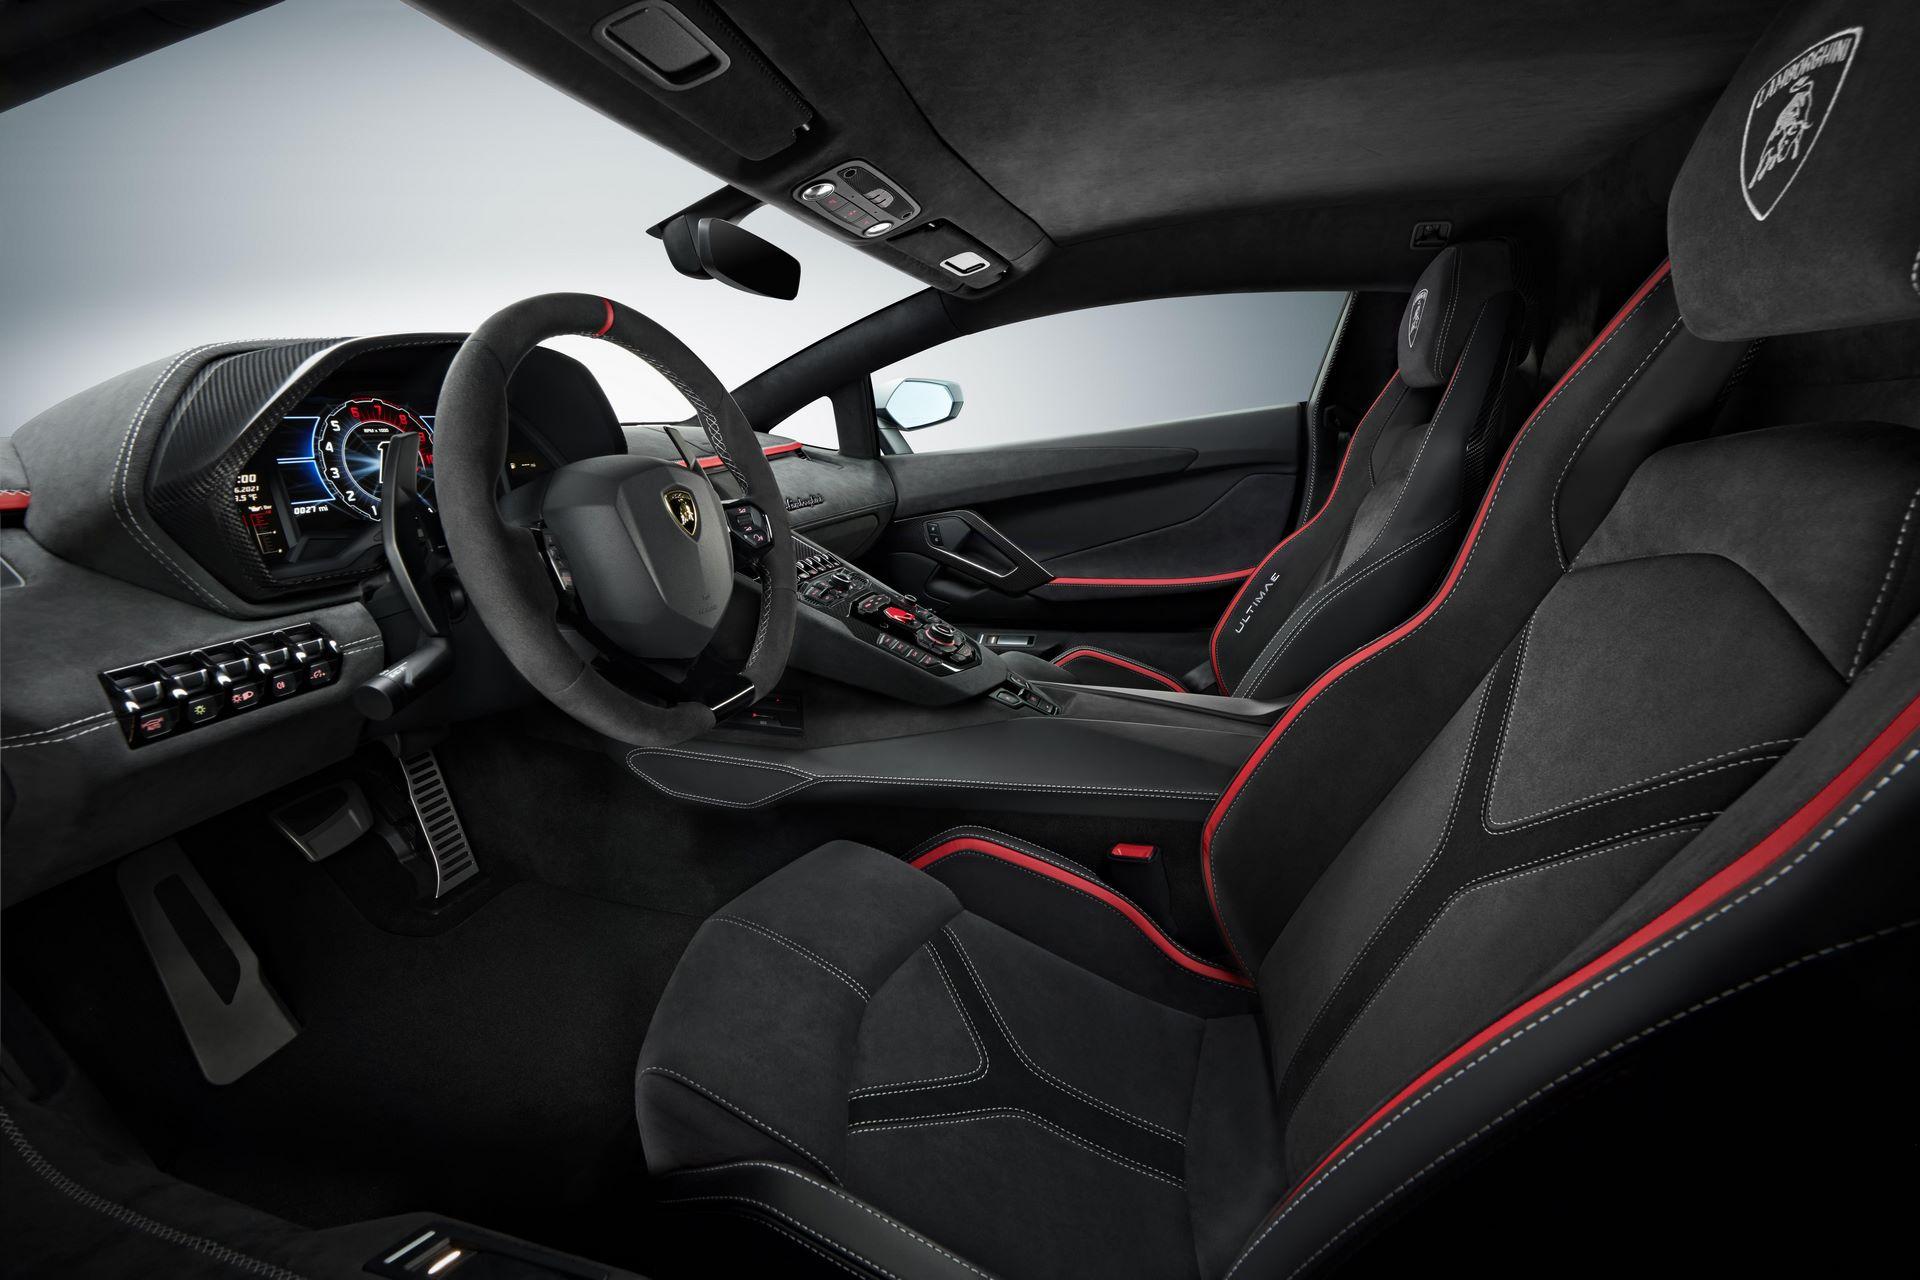 Lamborghini-Aventador-LP780-4-Ultimae-14